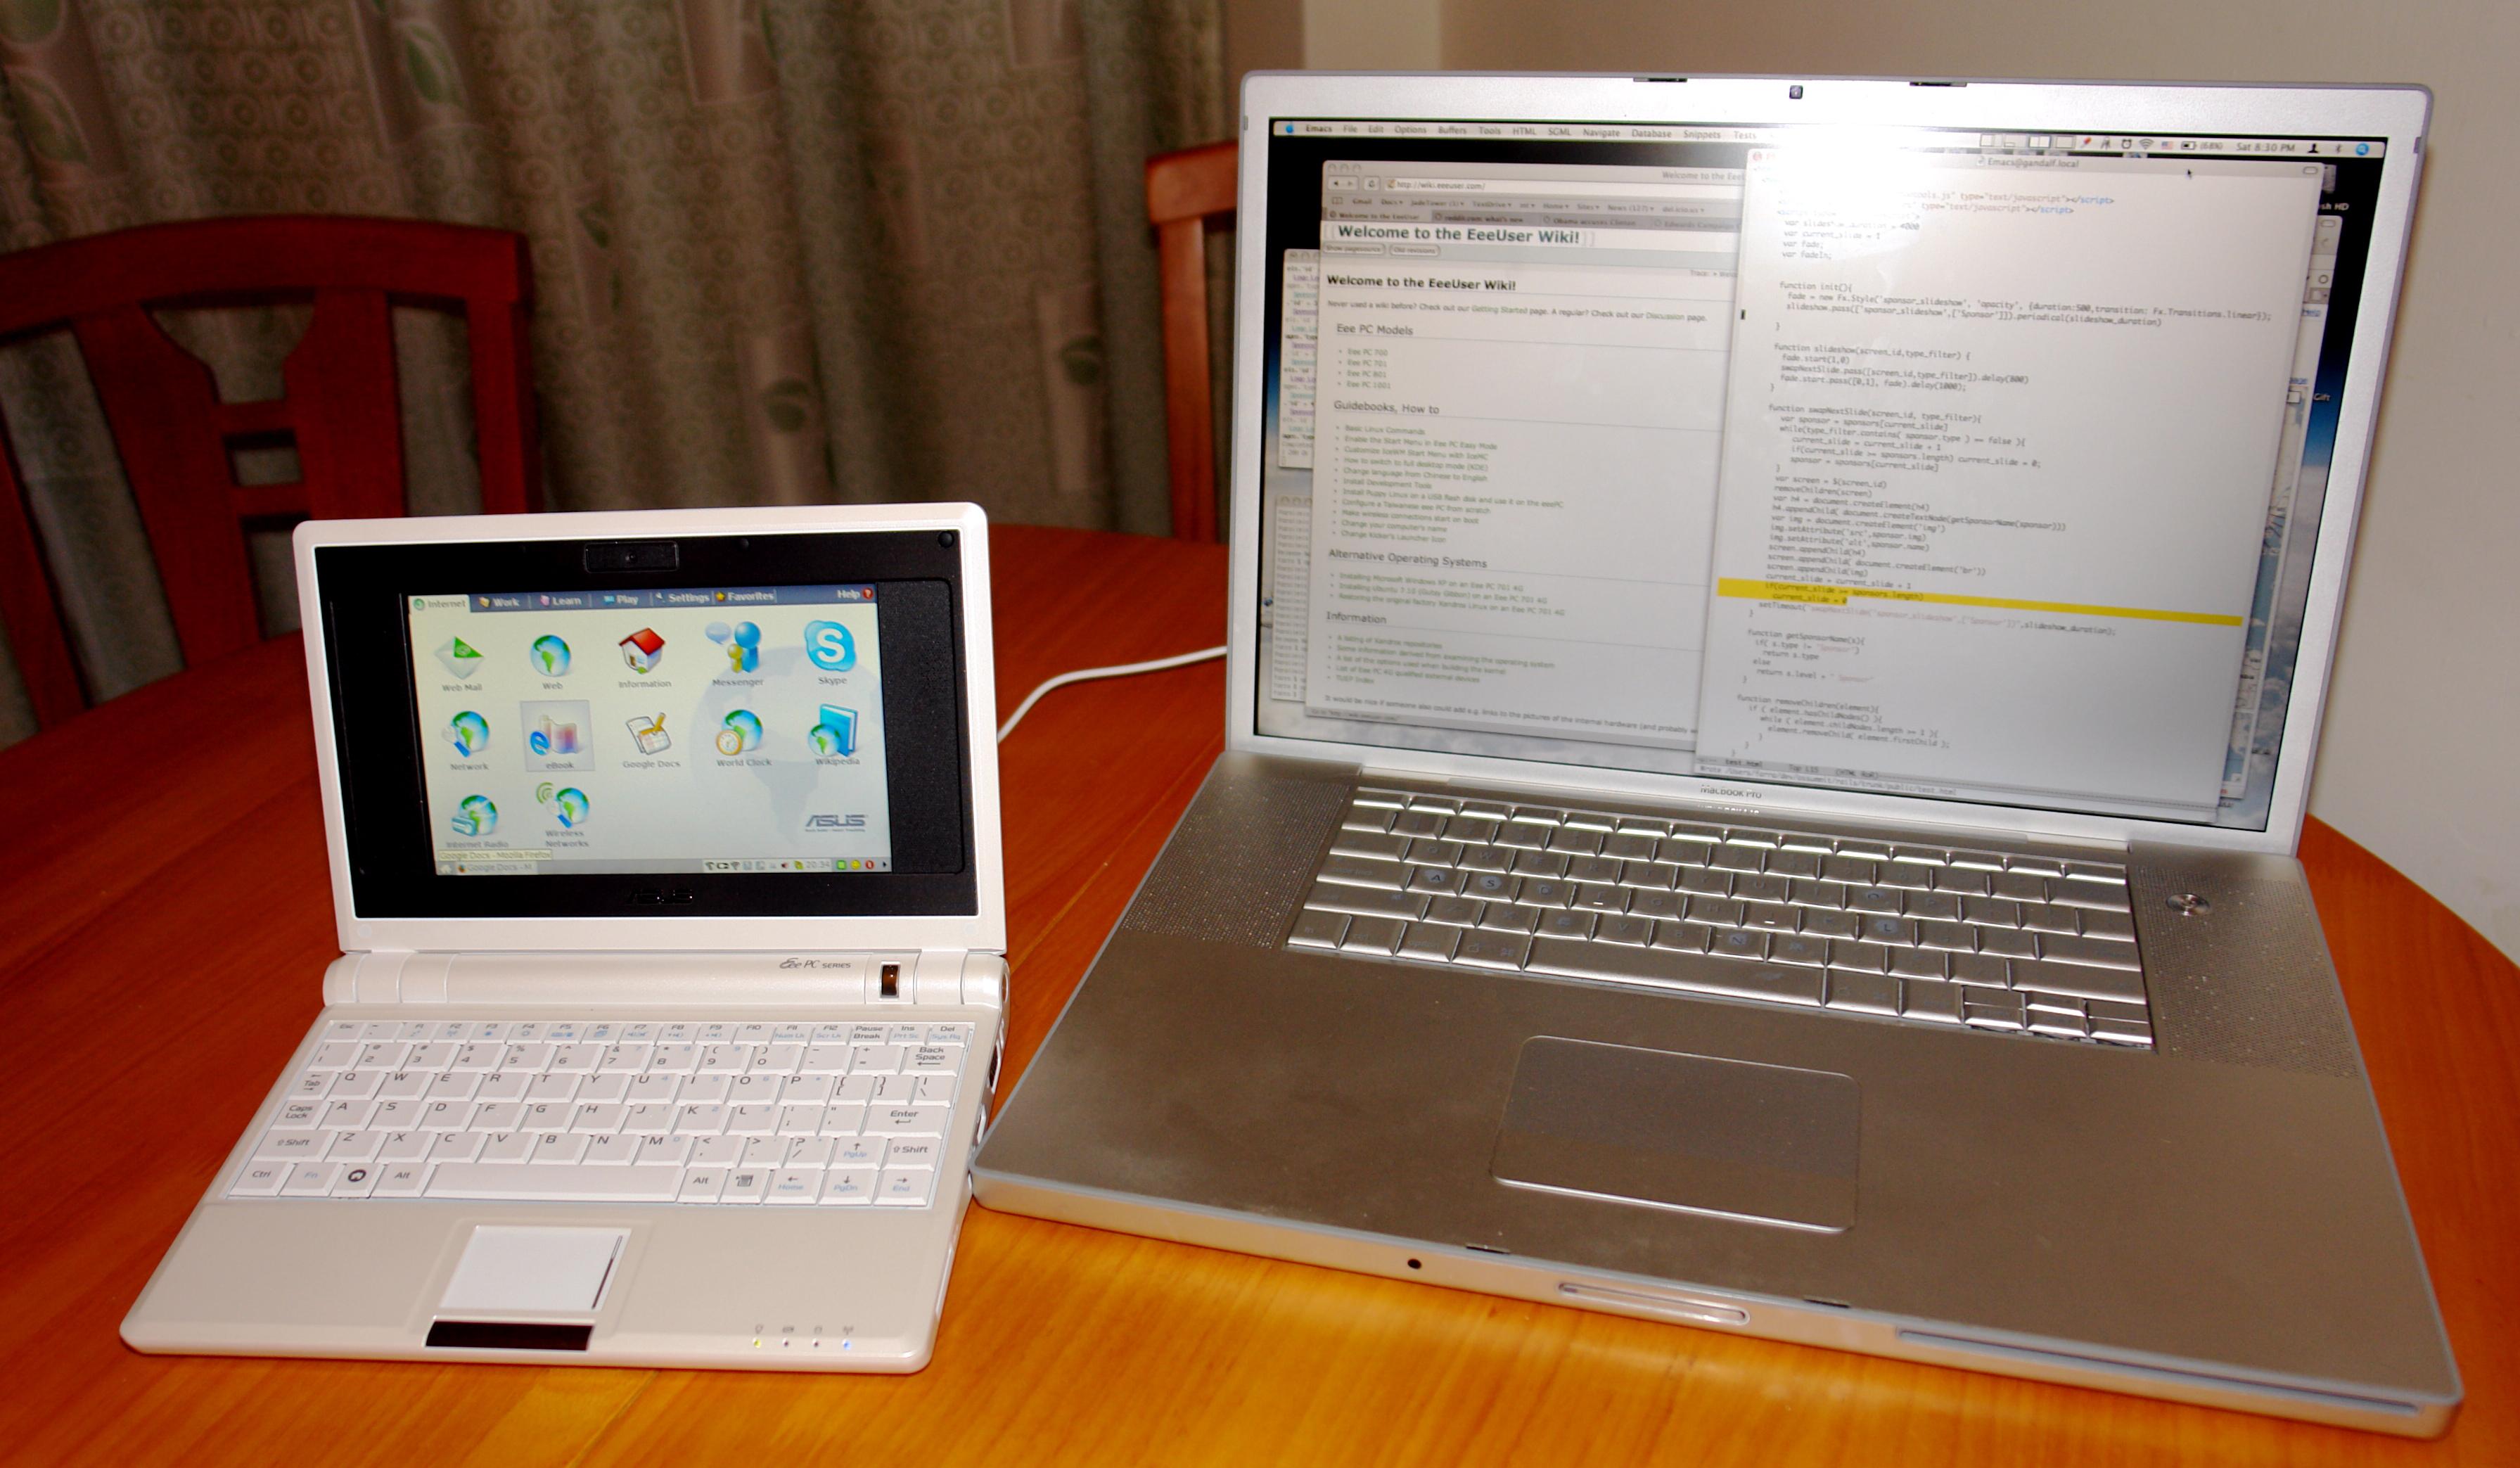 file asus eee pc versus 17in macbook pro 1842304922